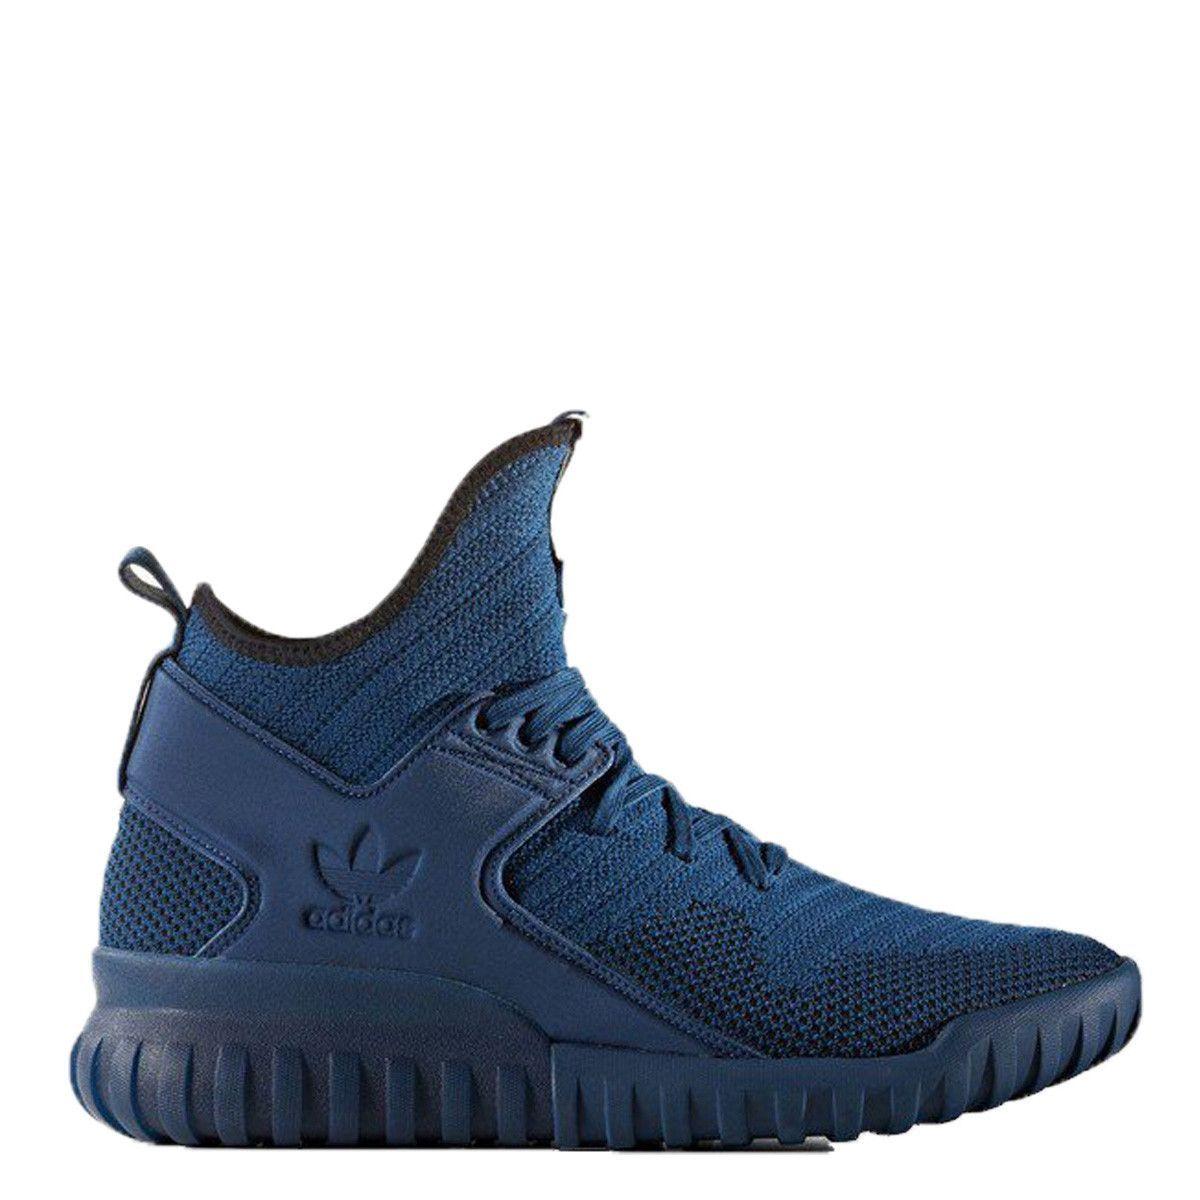 Normalización No puedo leer ni escribir Enderezar  ADIDAS TUBULAR X PK UNISEX SNEAKERS | Hype shoes, Sneakers, Nike free shoes